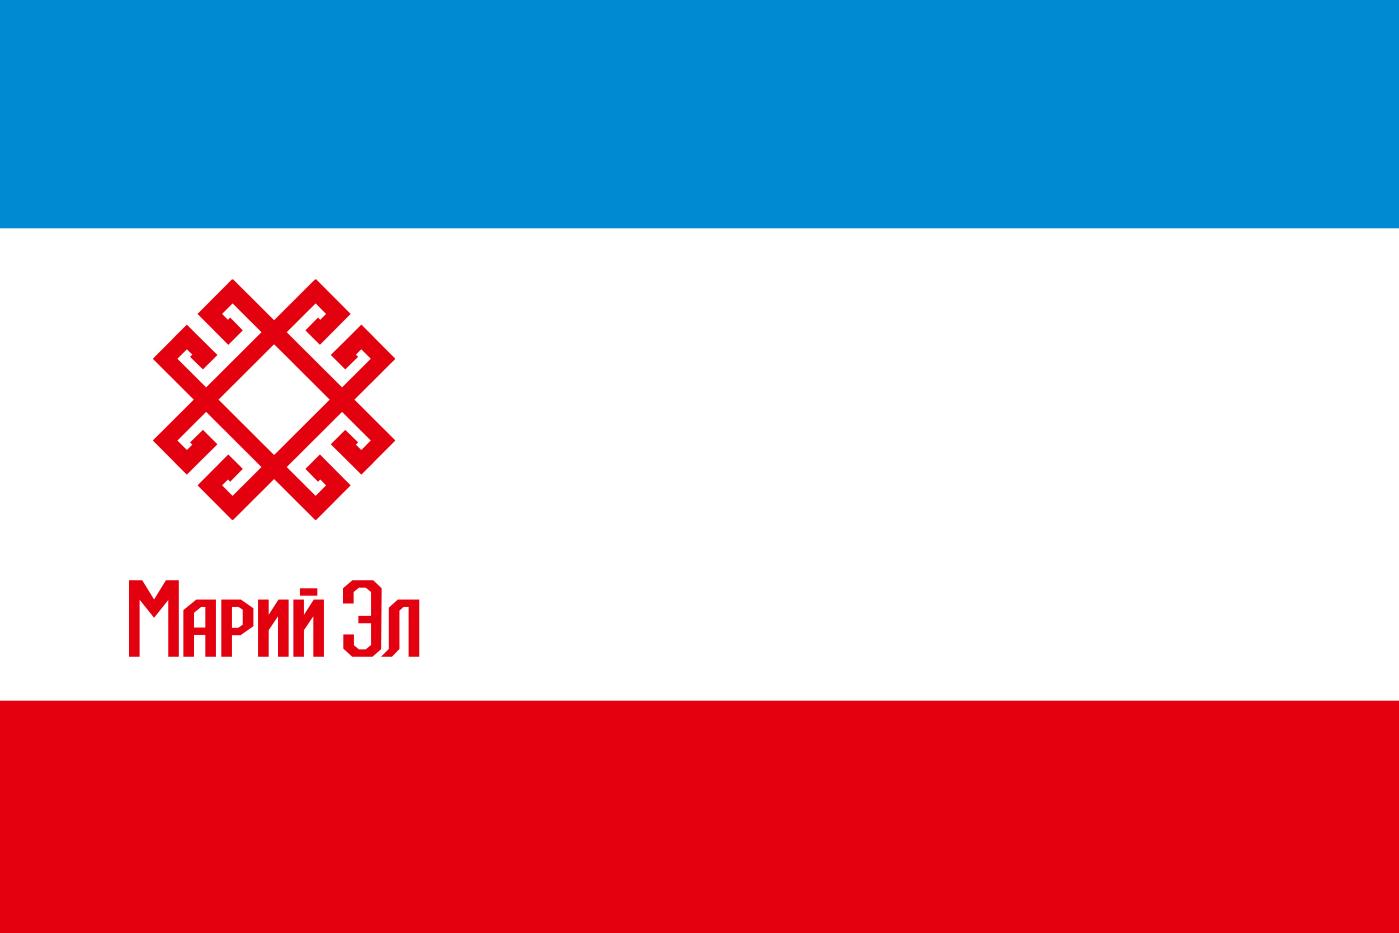 Флаг Республики Марий Эл 1992 года